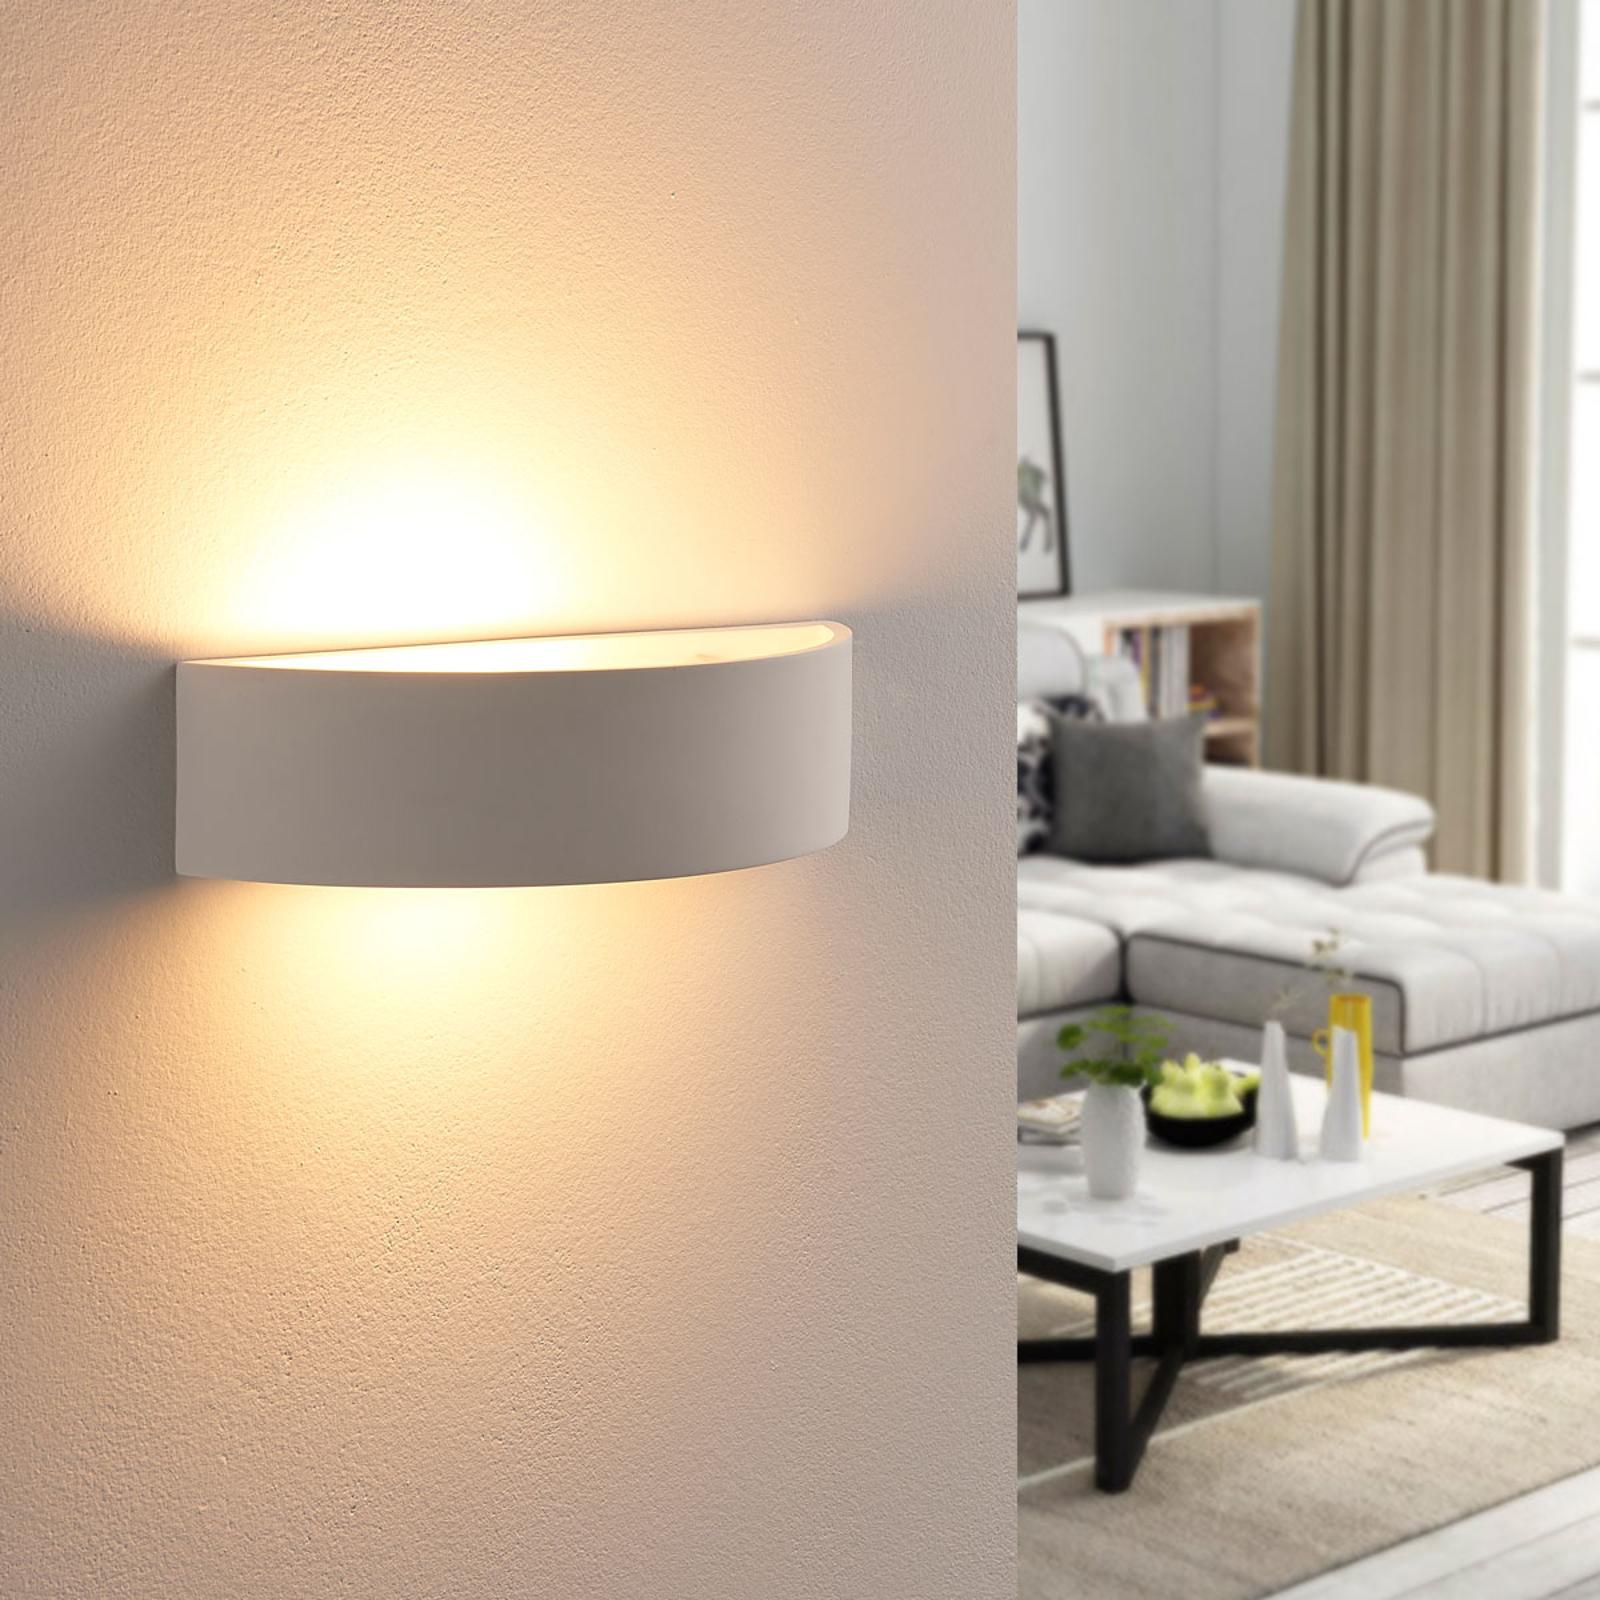 Halvrund gipsvägglampa Aurel, Easydim-LED-lampa